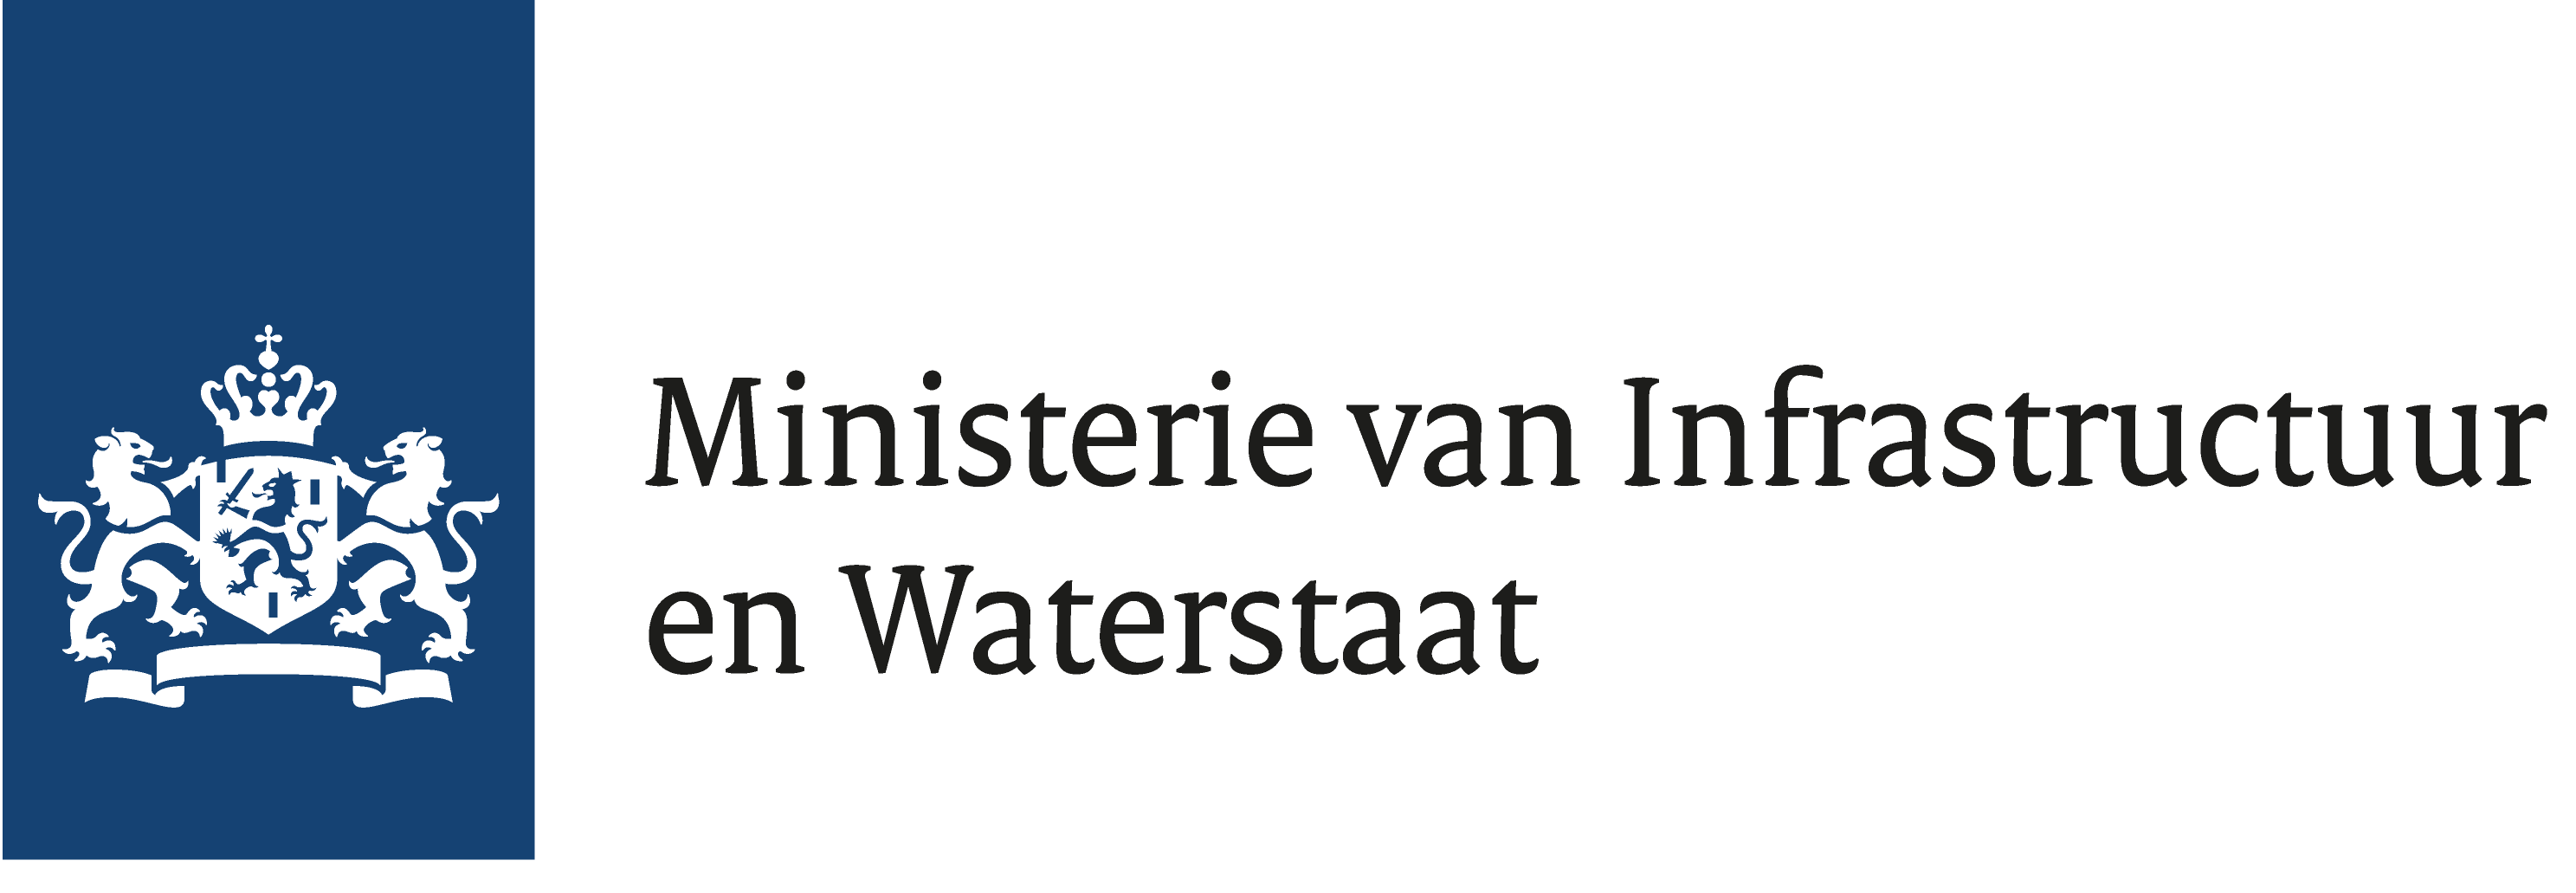 https://derechtmakers.nl/wp-content/uploads/2019/10/IW_Logo_online_rw-e1571939734774.png